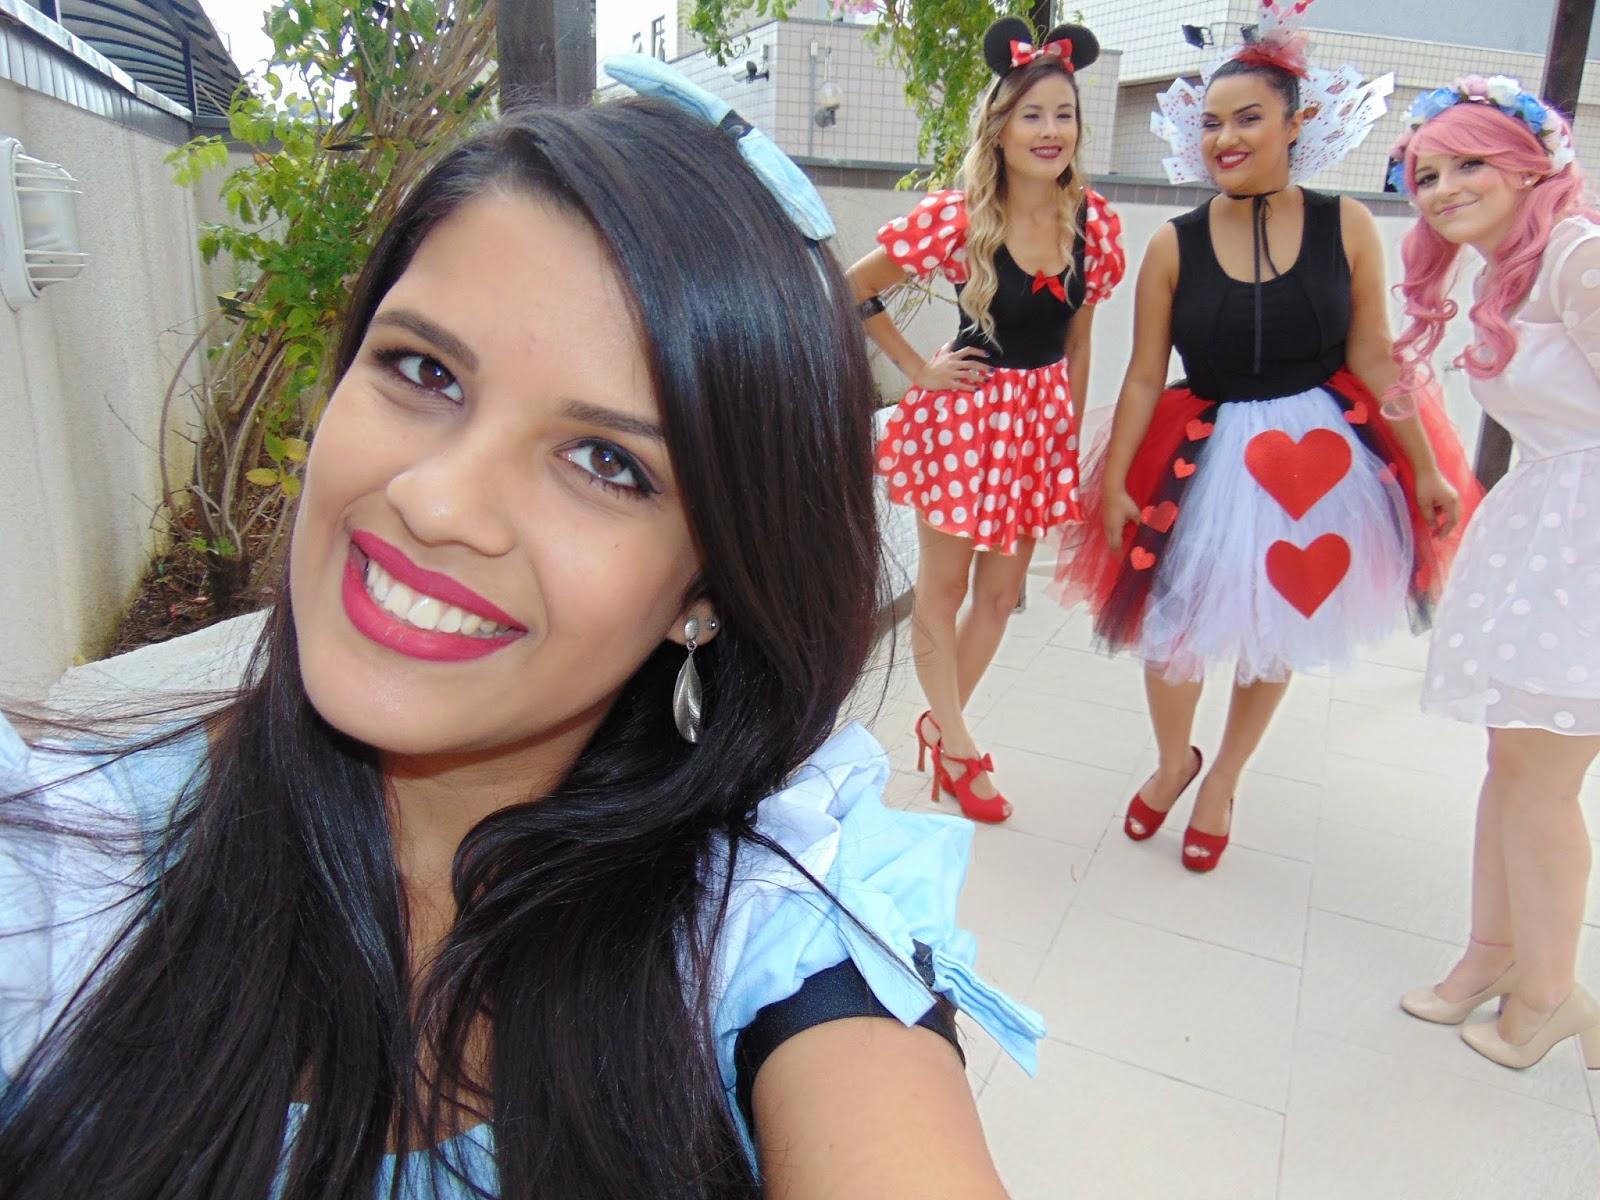 Festa a Fantasia Blogueiras de Curitiba e região - Ally Arruda